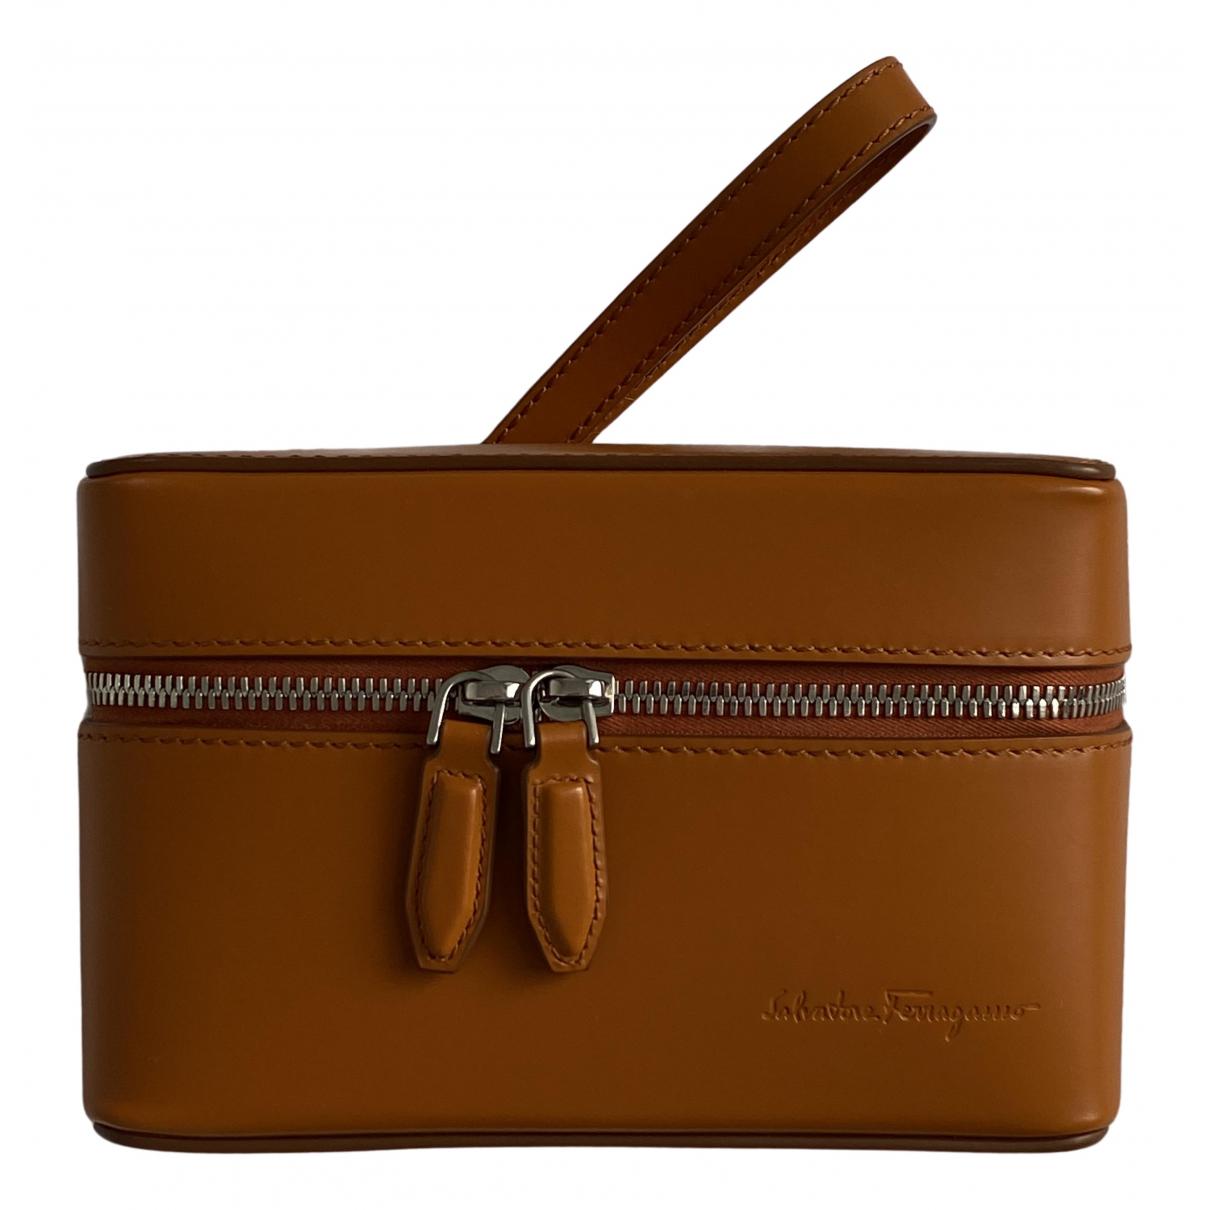 Salvatore Ferragamo N Orange Leather Clutch bag for Women N